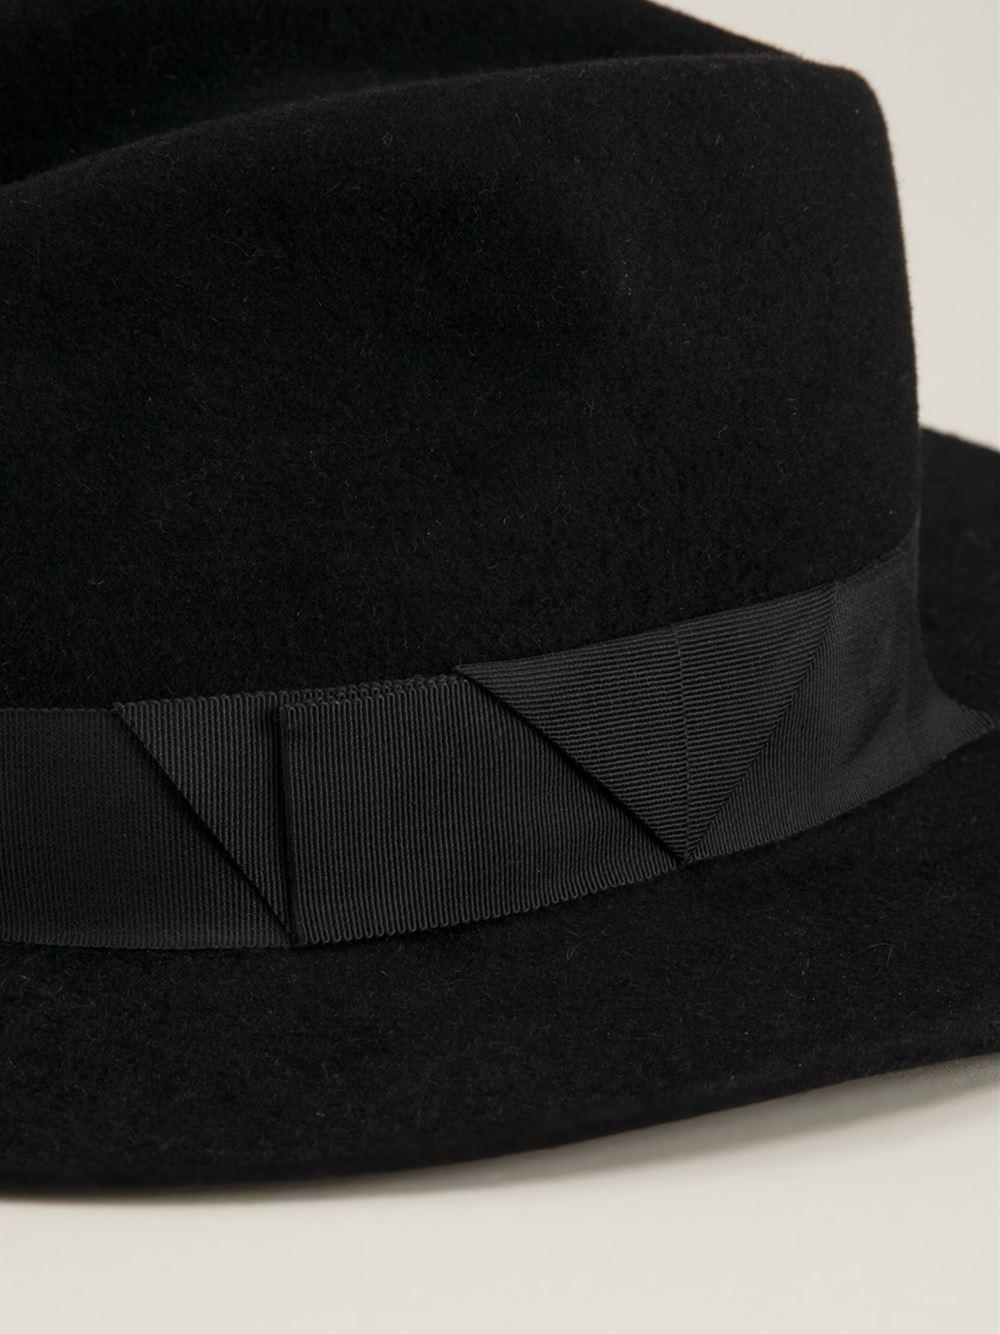 Gladys tamez millinery 'saint marie' hat